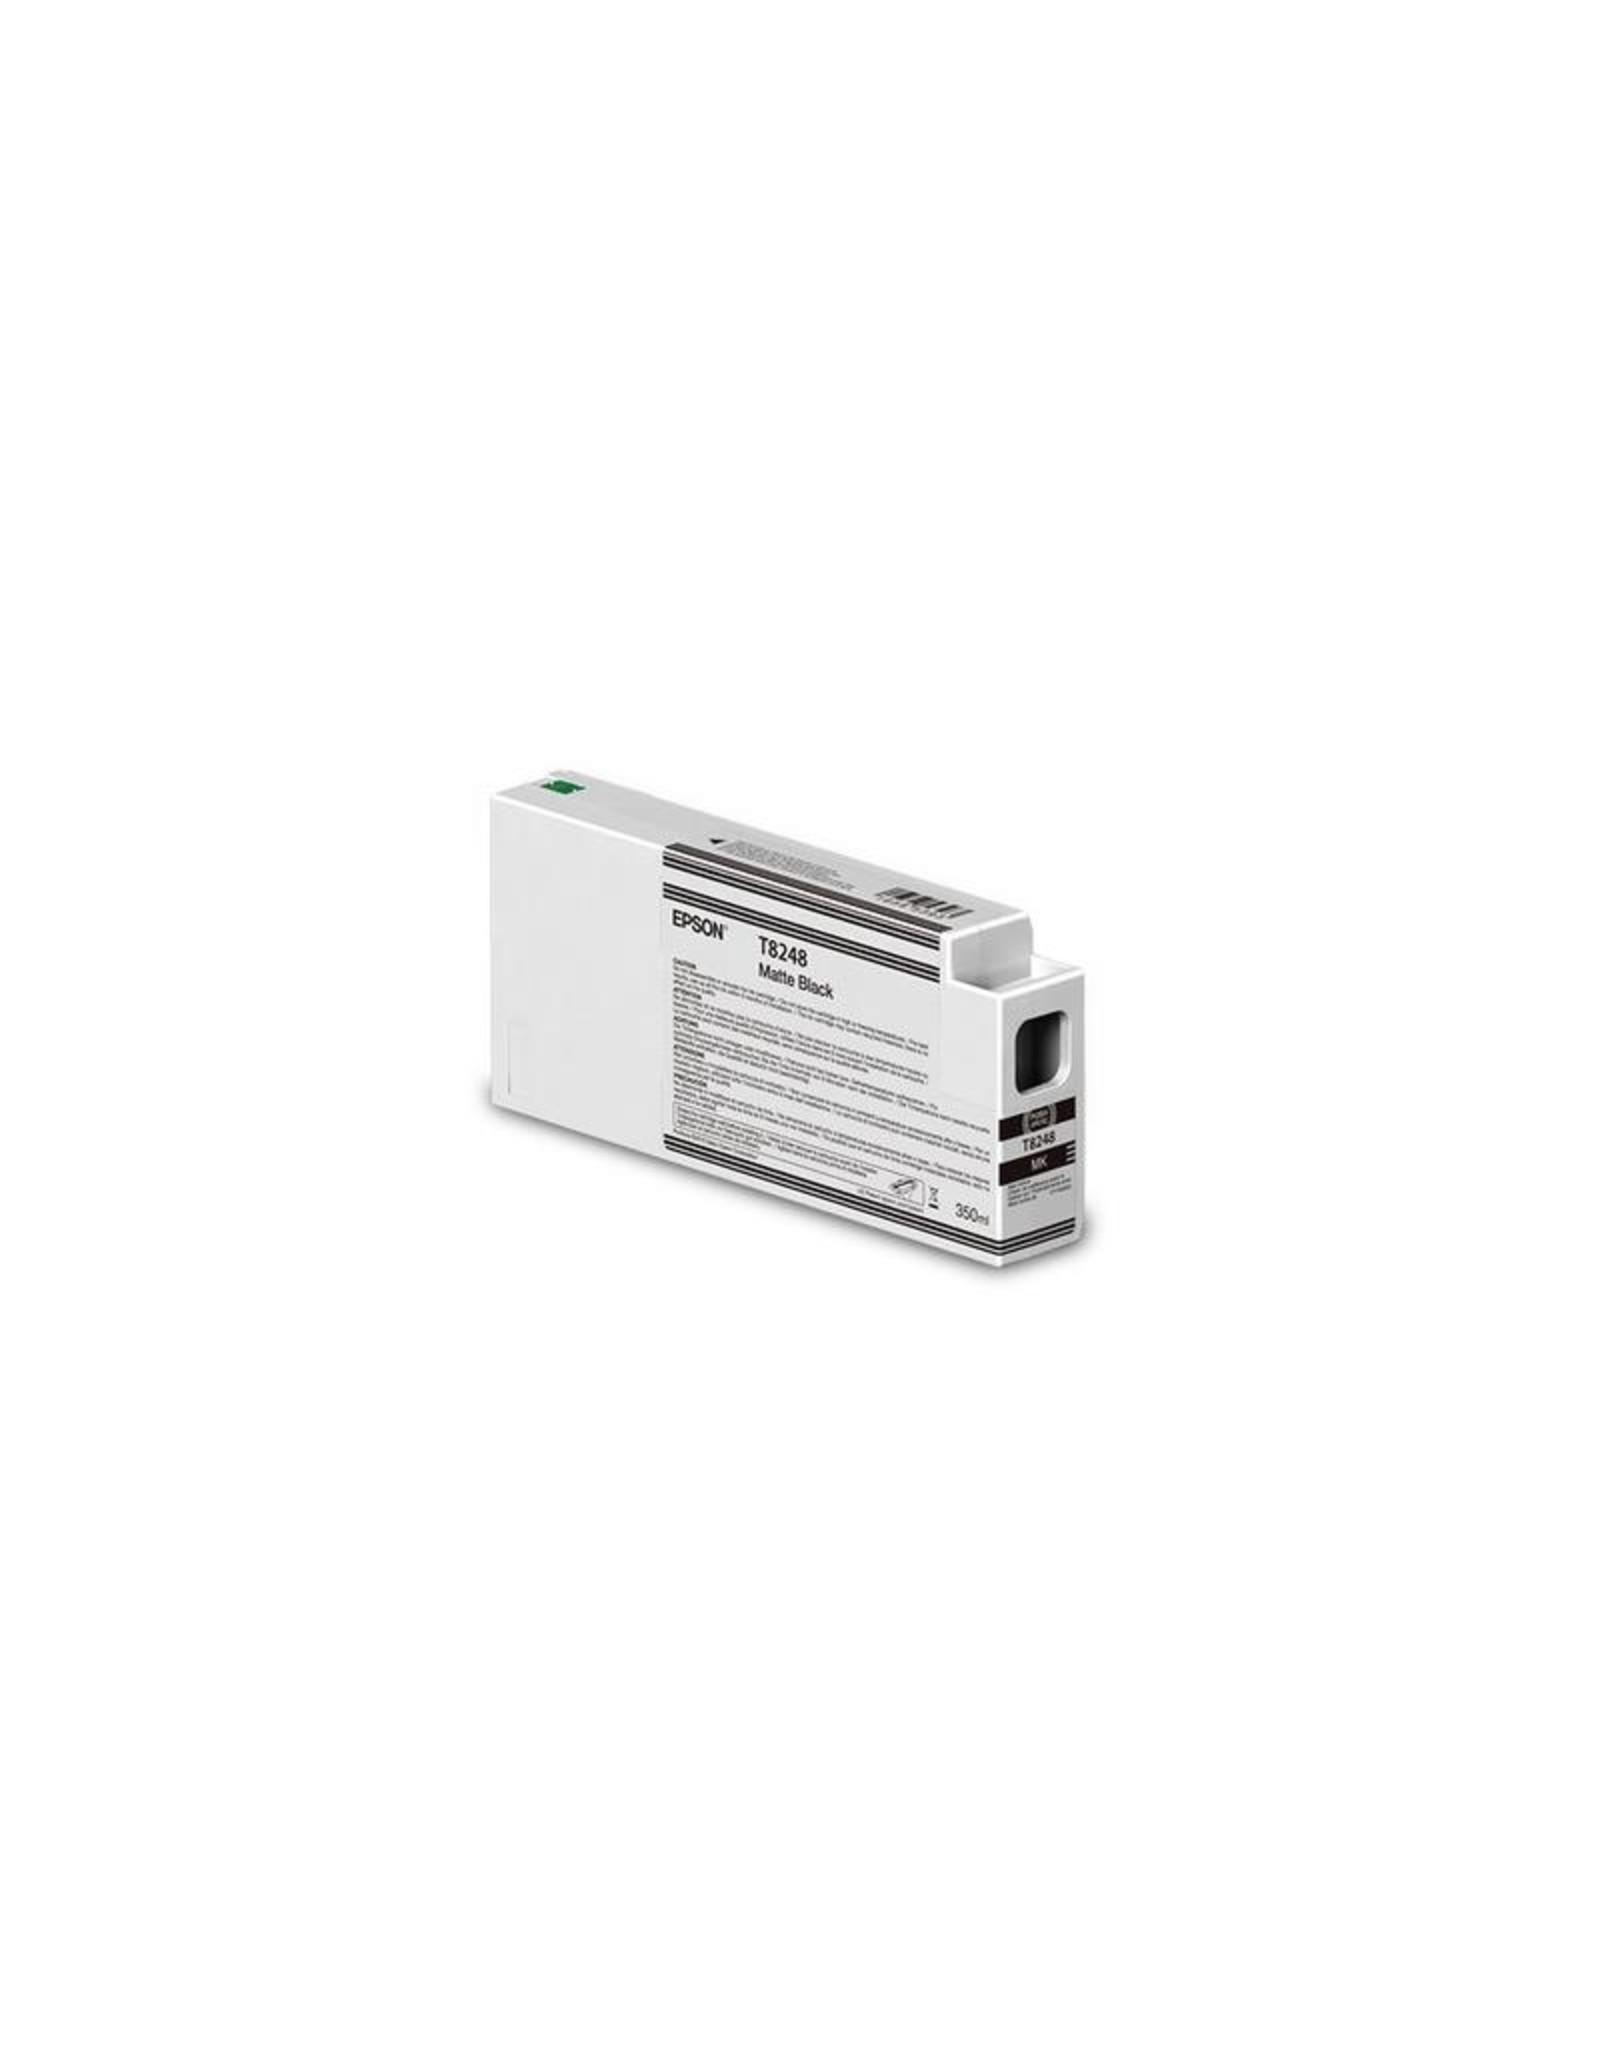 Epson Epson T824800 Ultrachrome HD Matte BLK ink 350ML